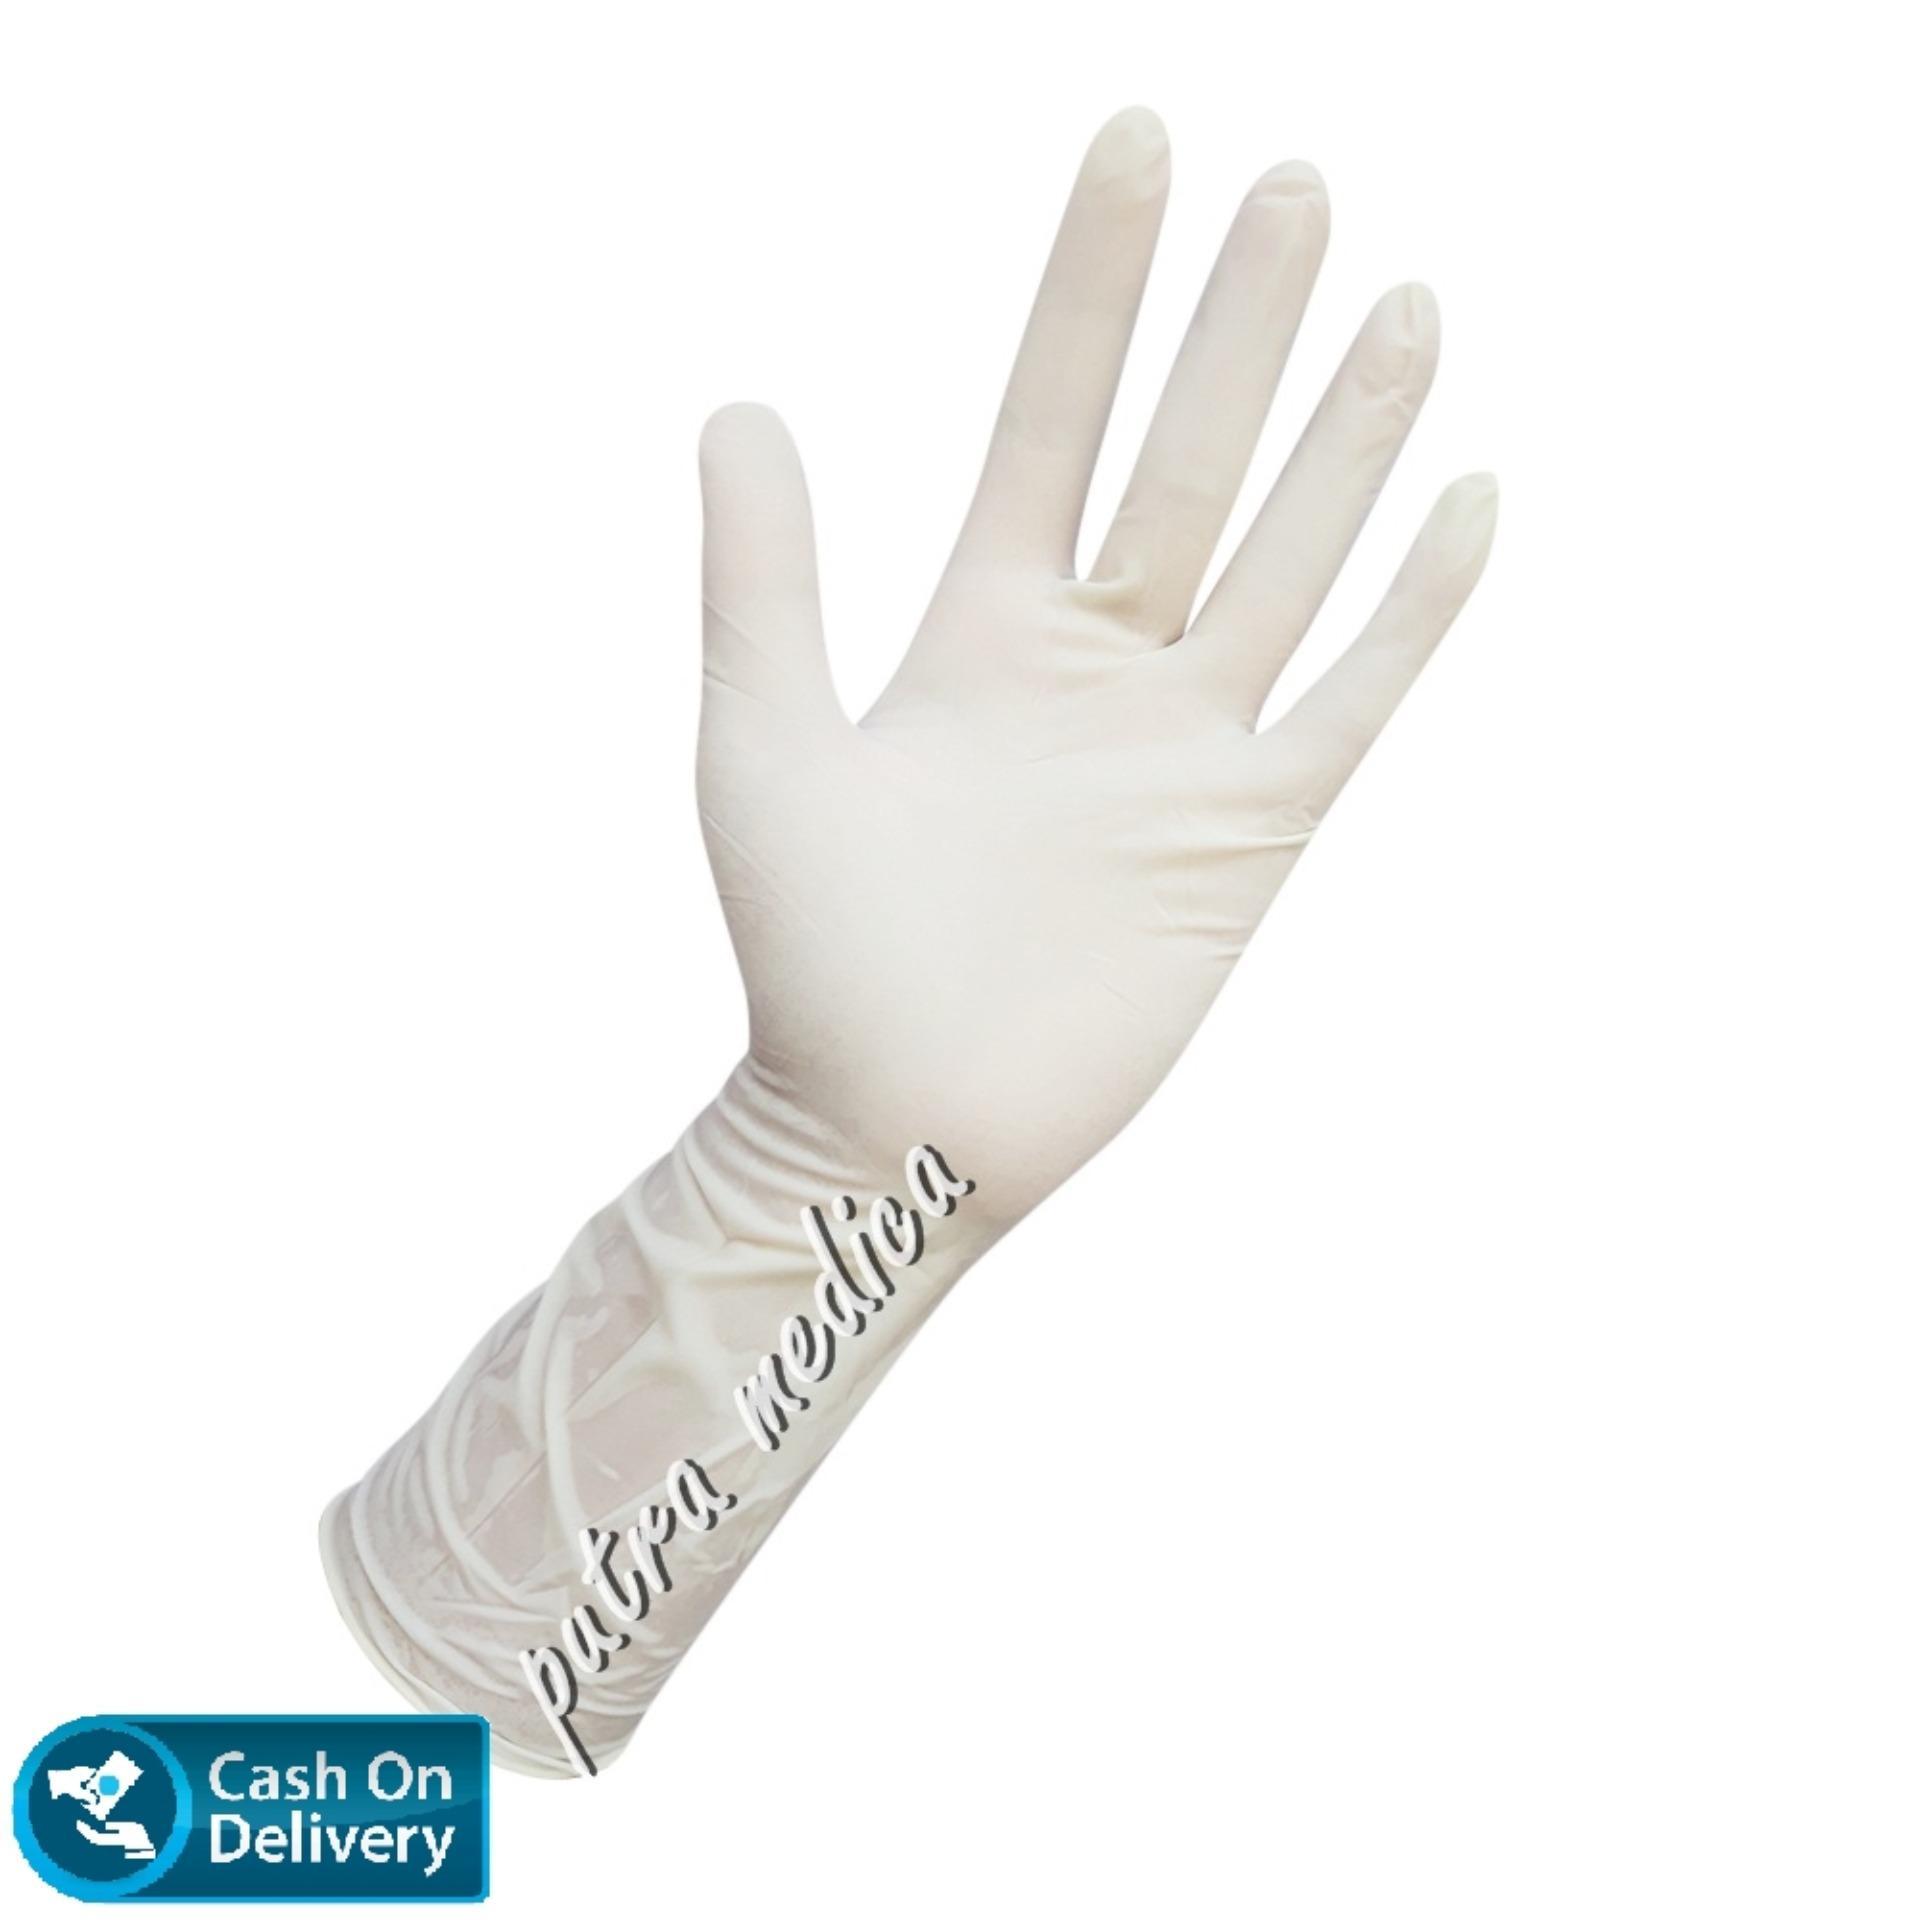 Putra Medica Maxter Handscoon Steril Size 7 - 1 Pasang / Sarung Tangan Karet Latex Steril